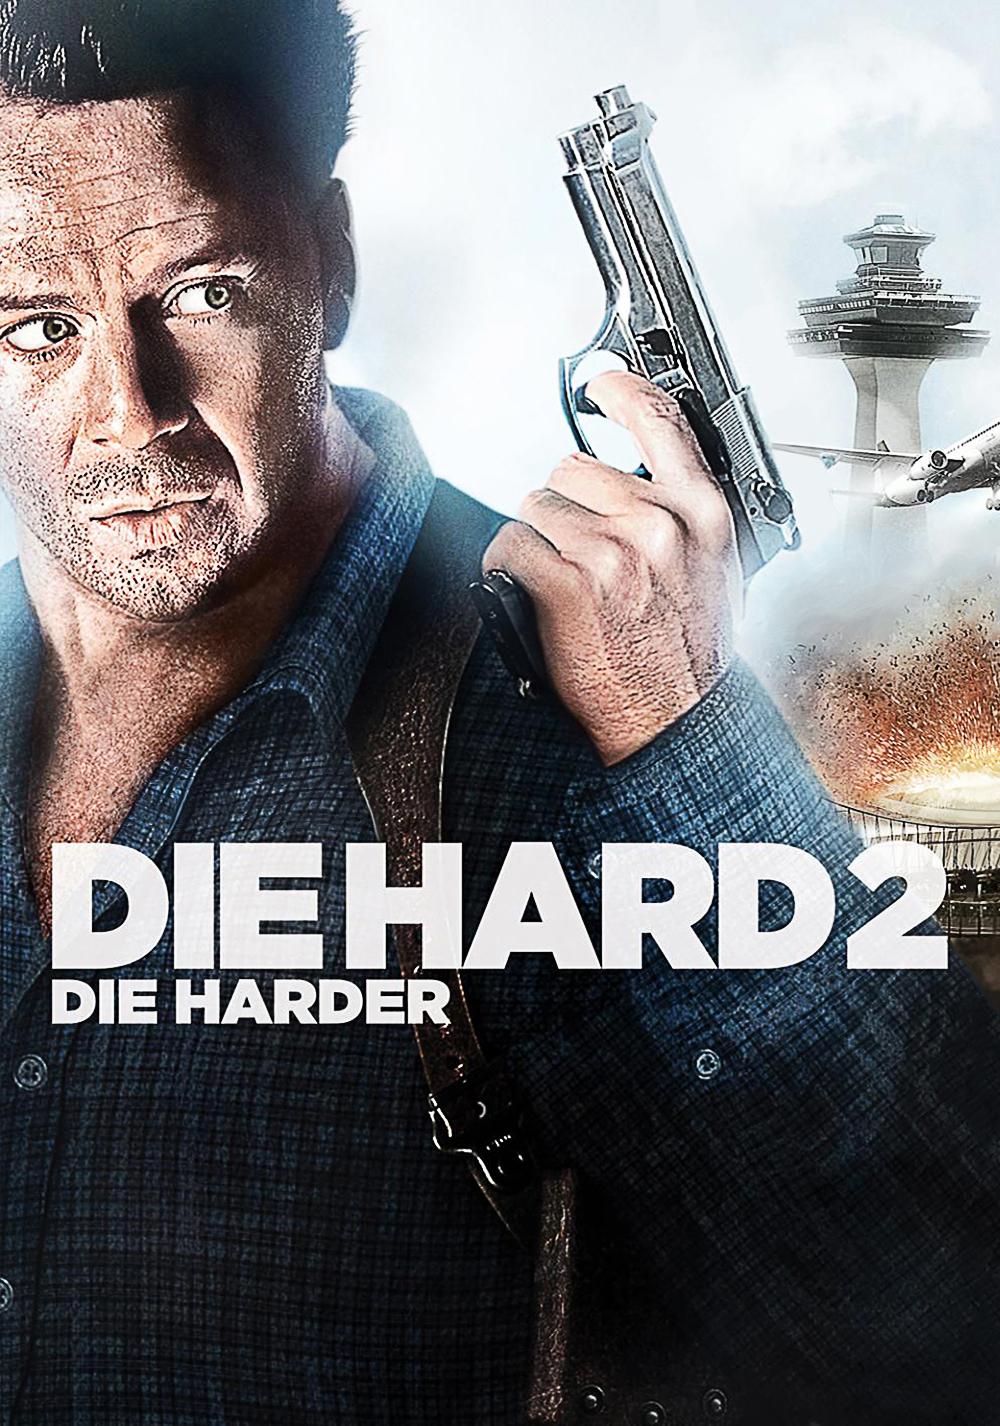 Die Hard 2 - Full Cast & Crew - IMDb